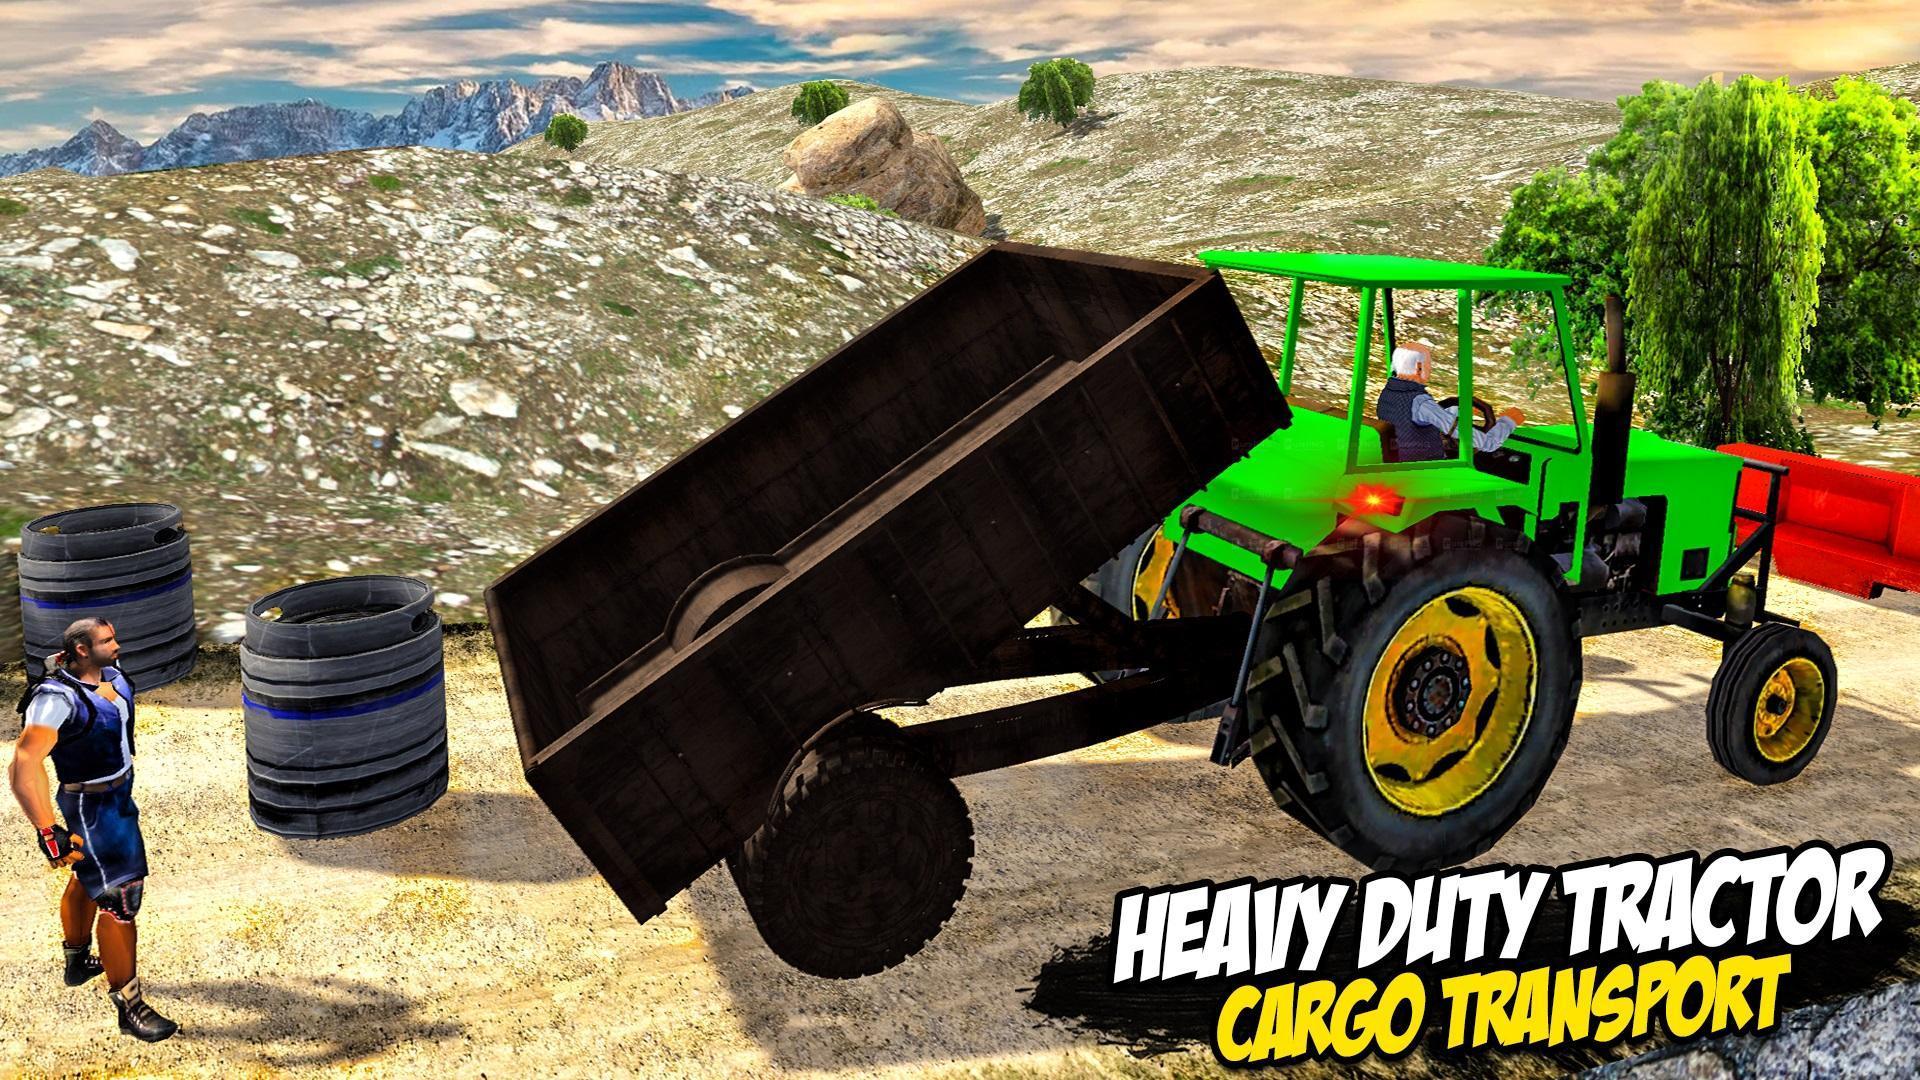 Heavy Tractor Trolley: Tractor Cargo Simulator🚜🚜 3.1 Screenshot 22